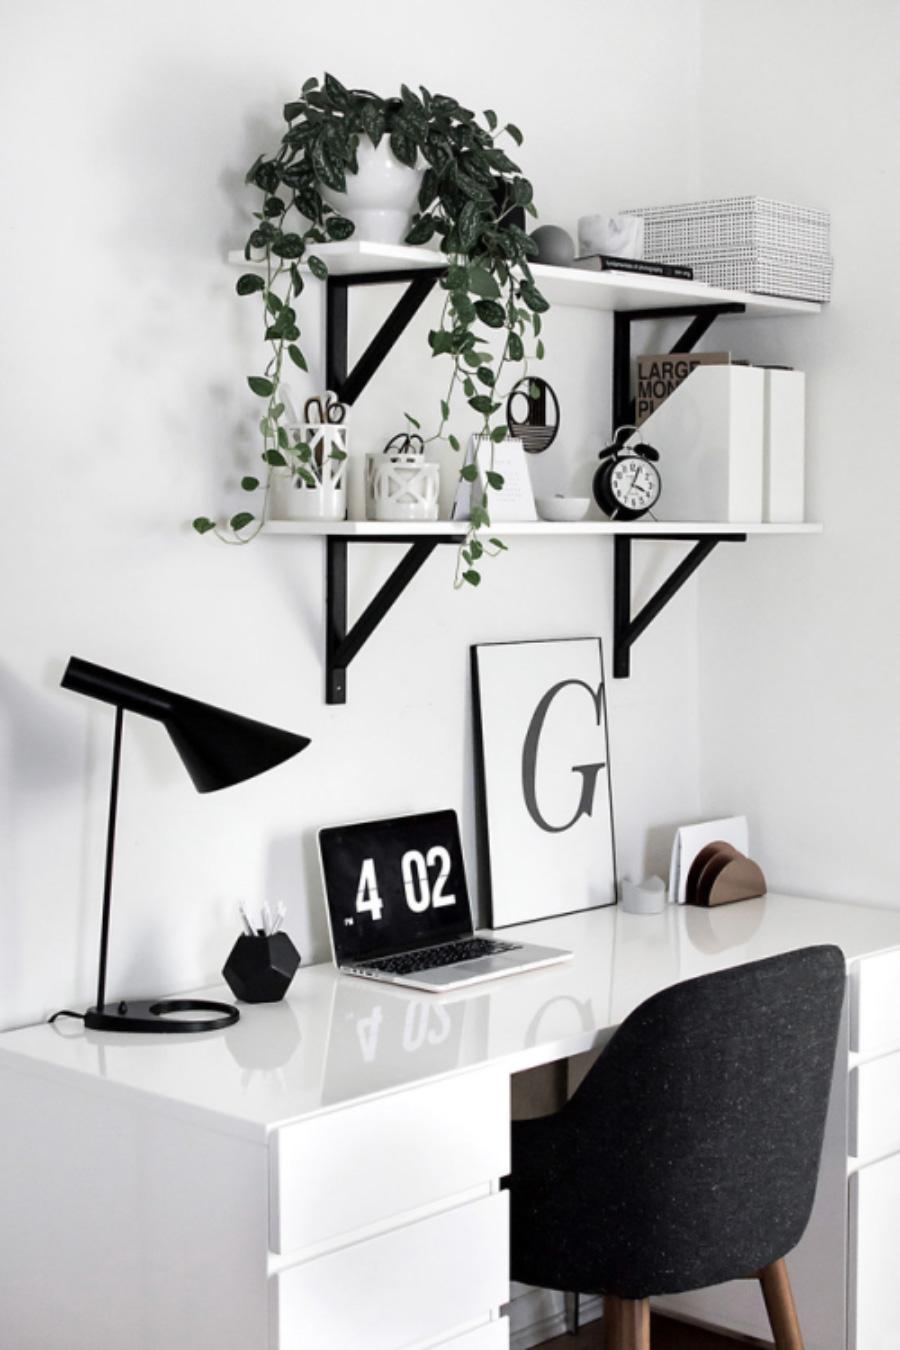 Minimalist Monochrome Interior Look - Home Office